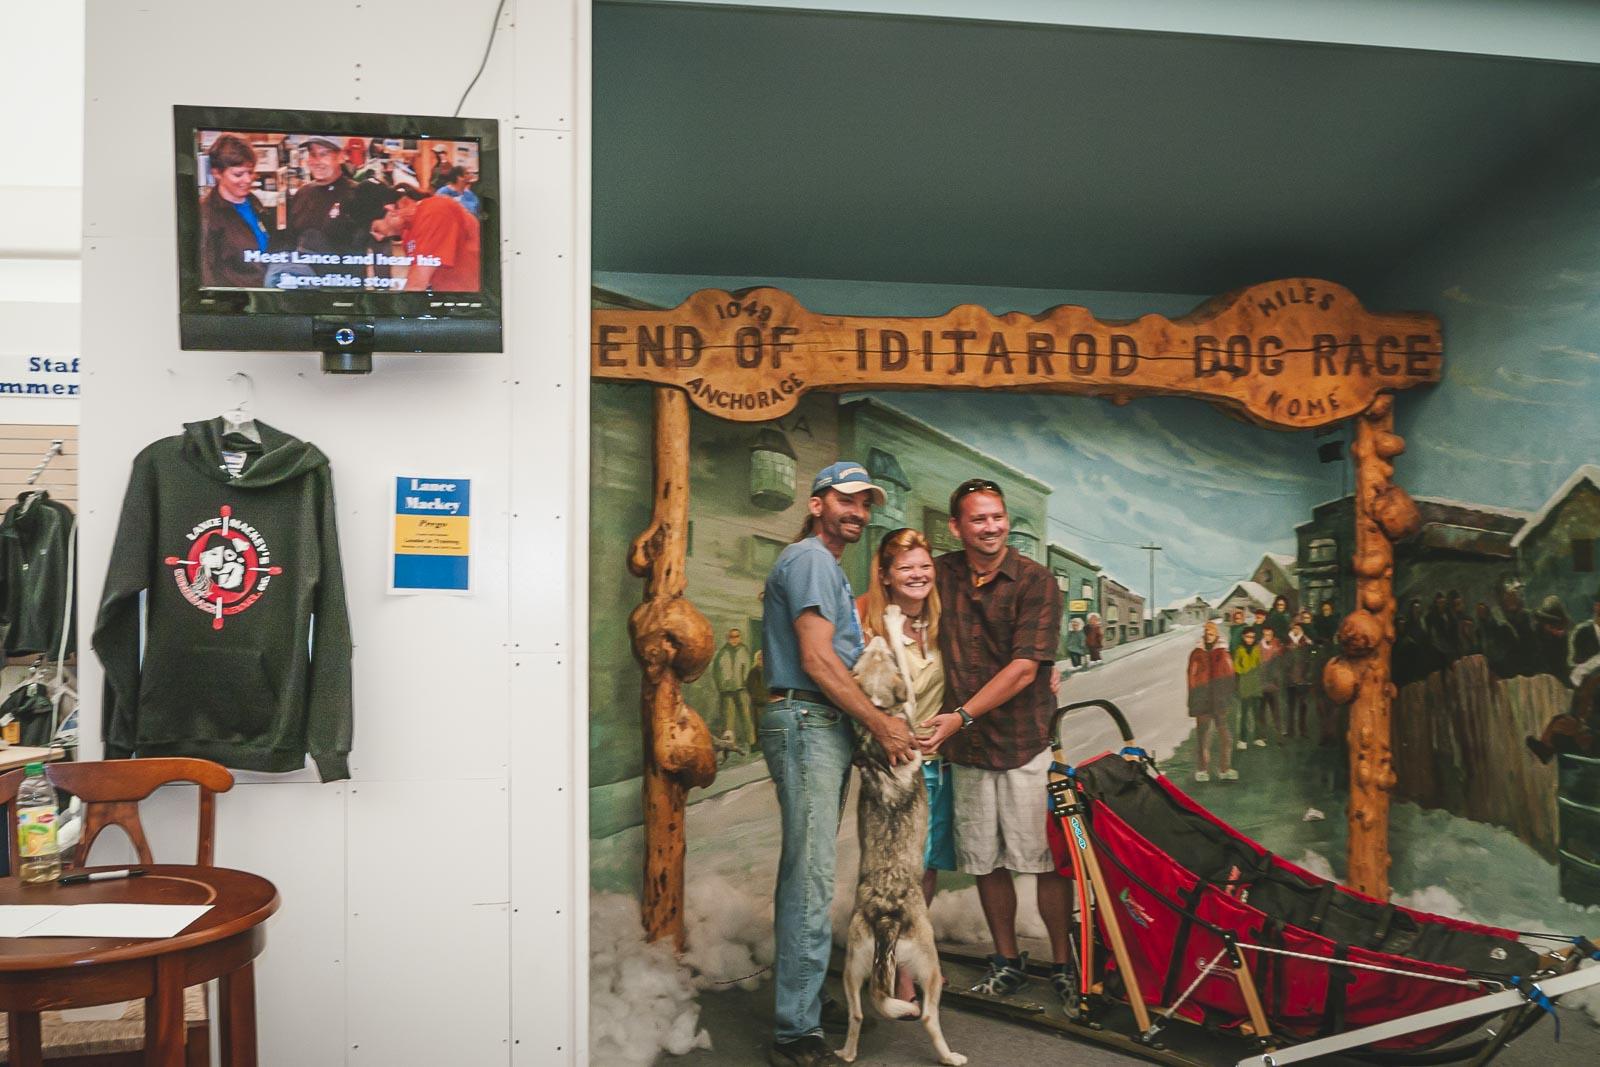 Iditerod Museum Alaska